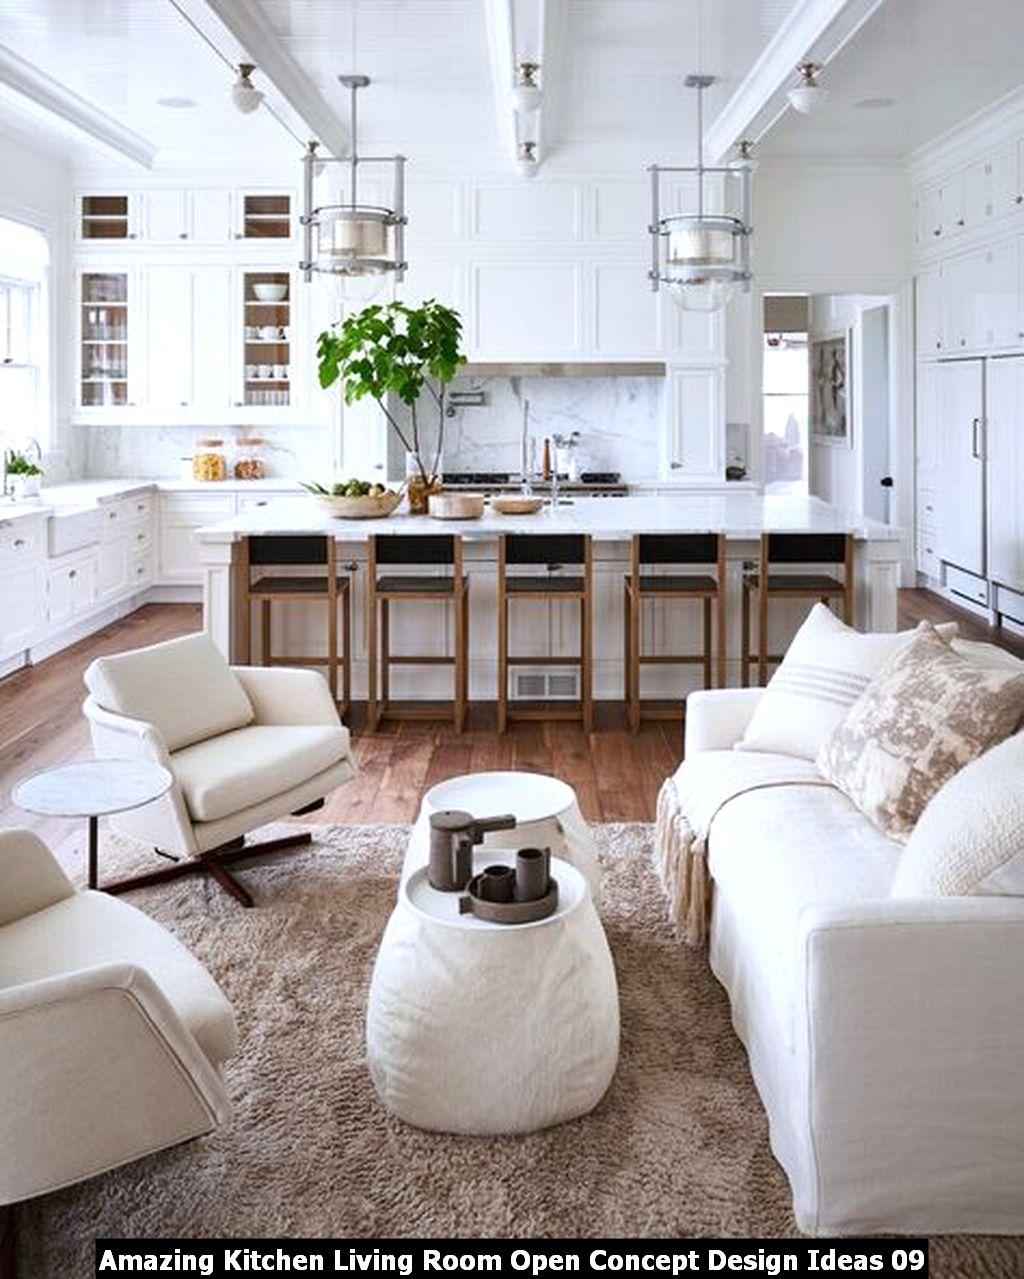 Amazing Kitchen Living Room Open Concept Design Ideas 09